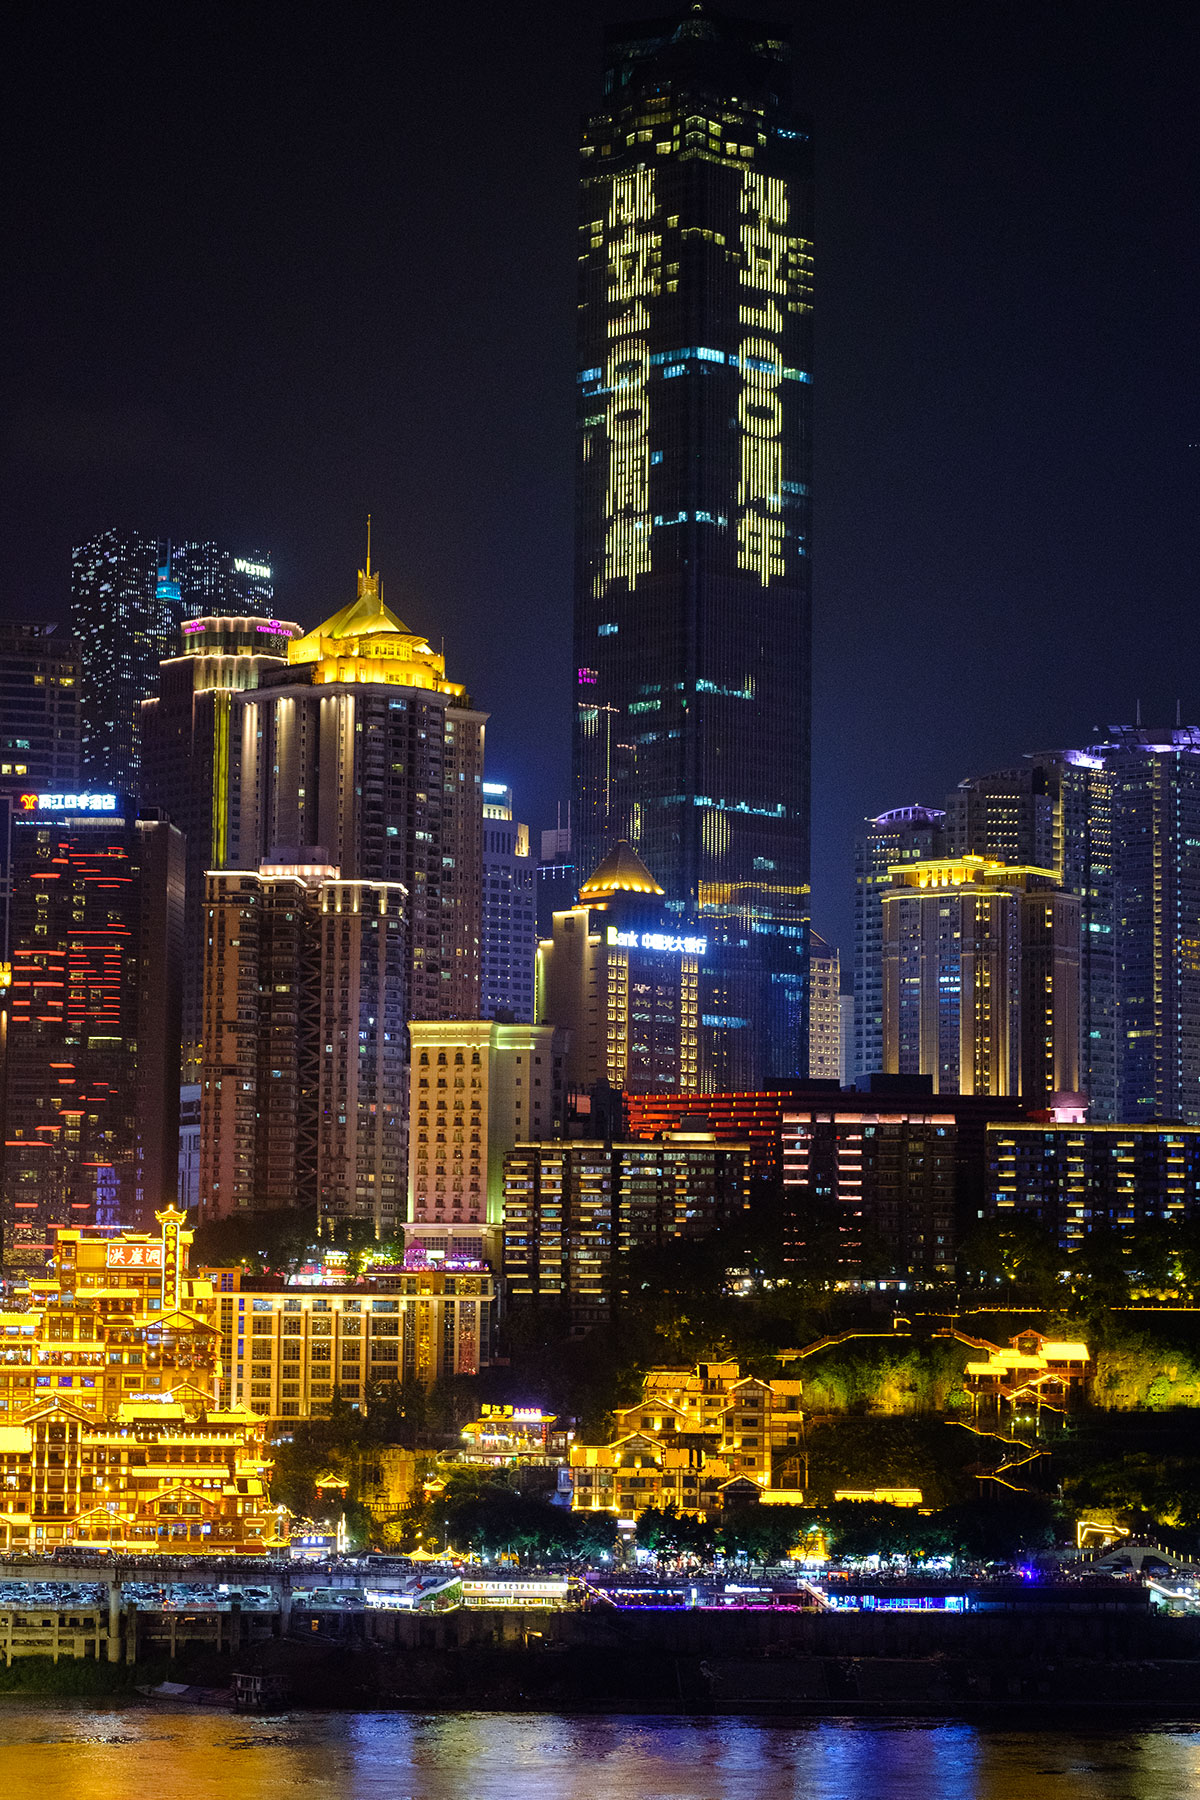 Skyline bei Nacht in Chongqing